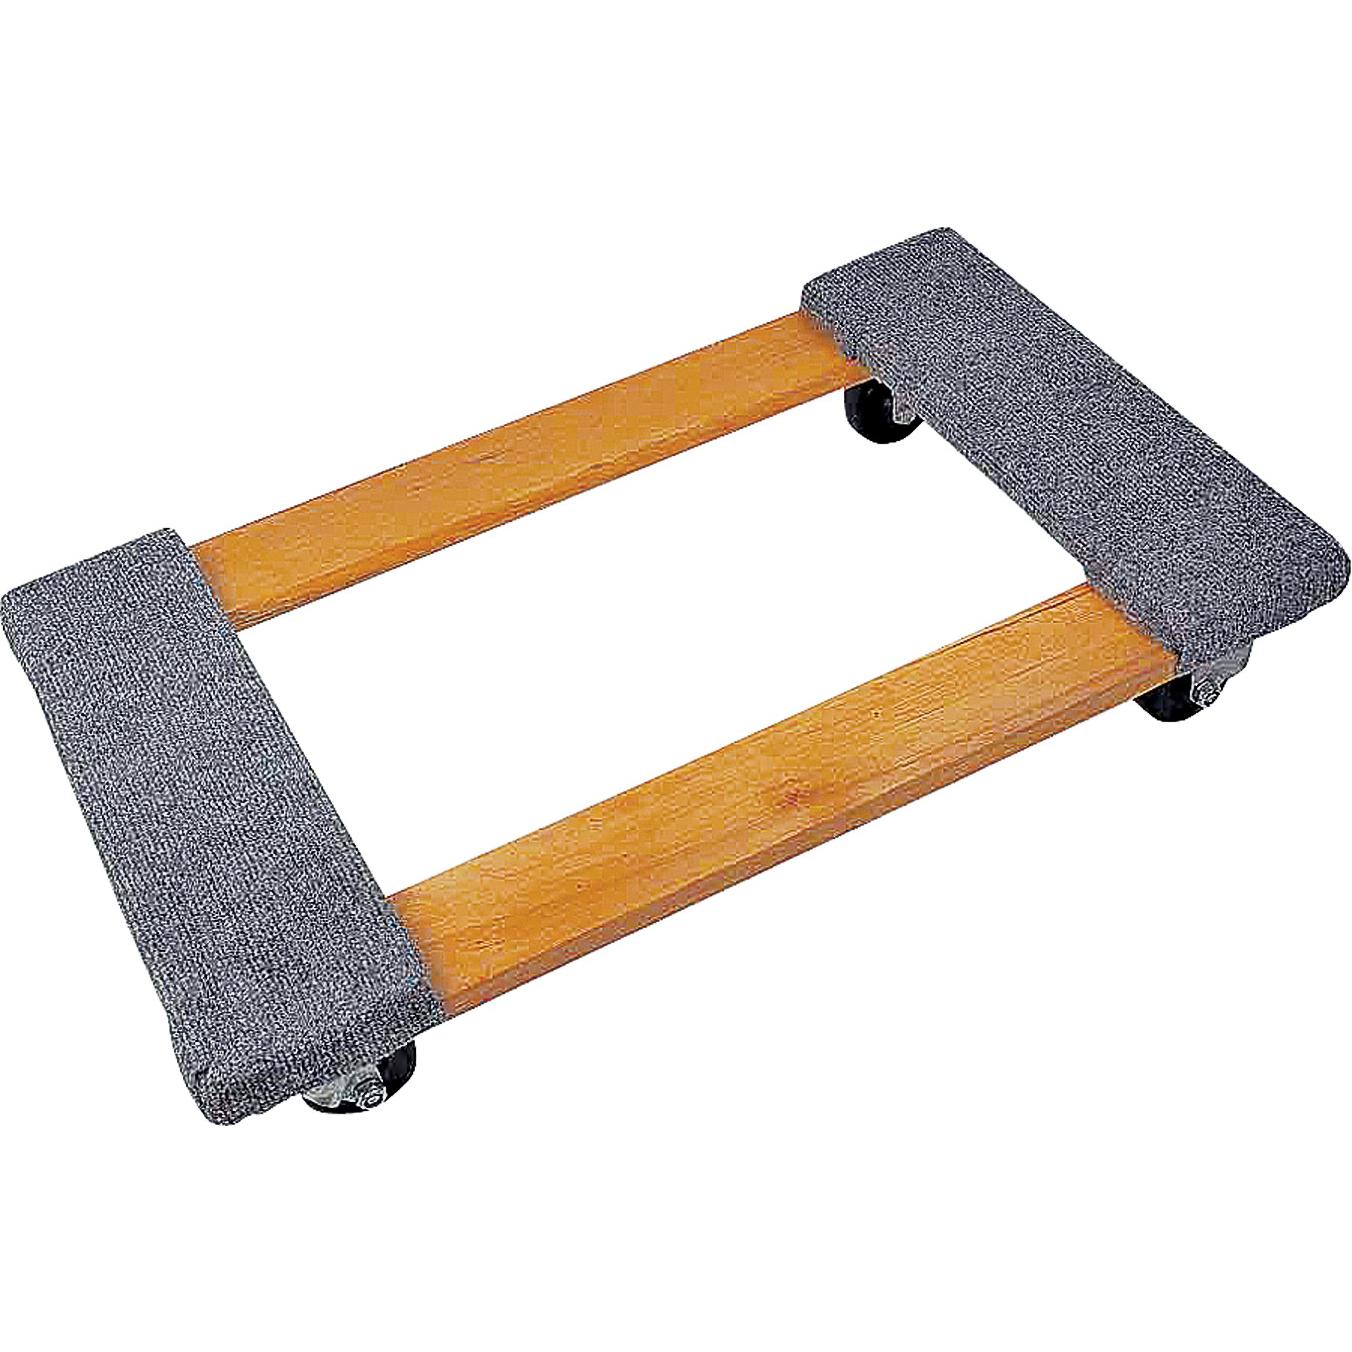 Picture of ProSource TC-500 Furniture Dolly, 1000 lb, 30 in W Platform, 18 in D Platform, Wood Construction Platform